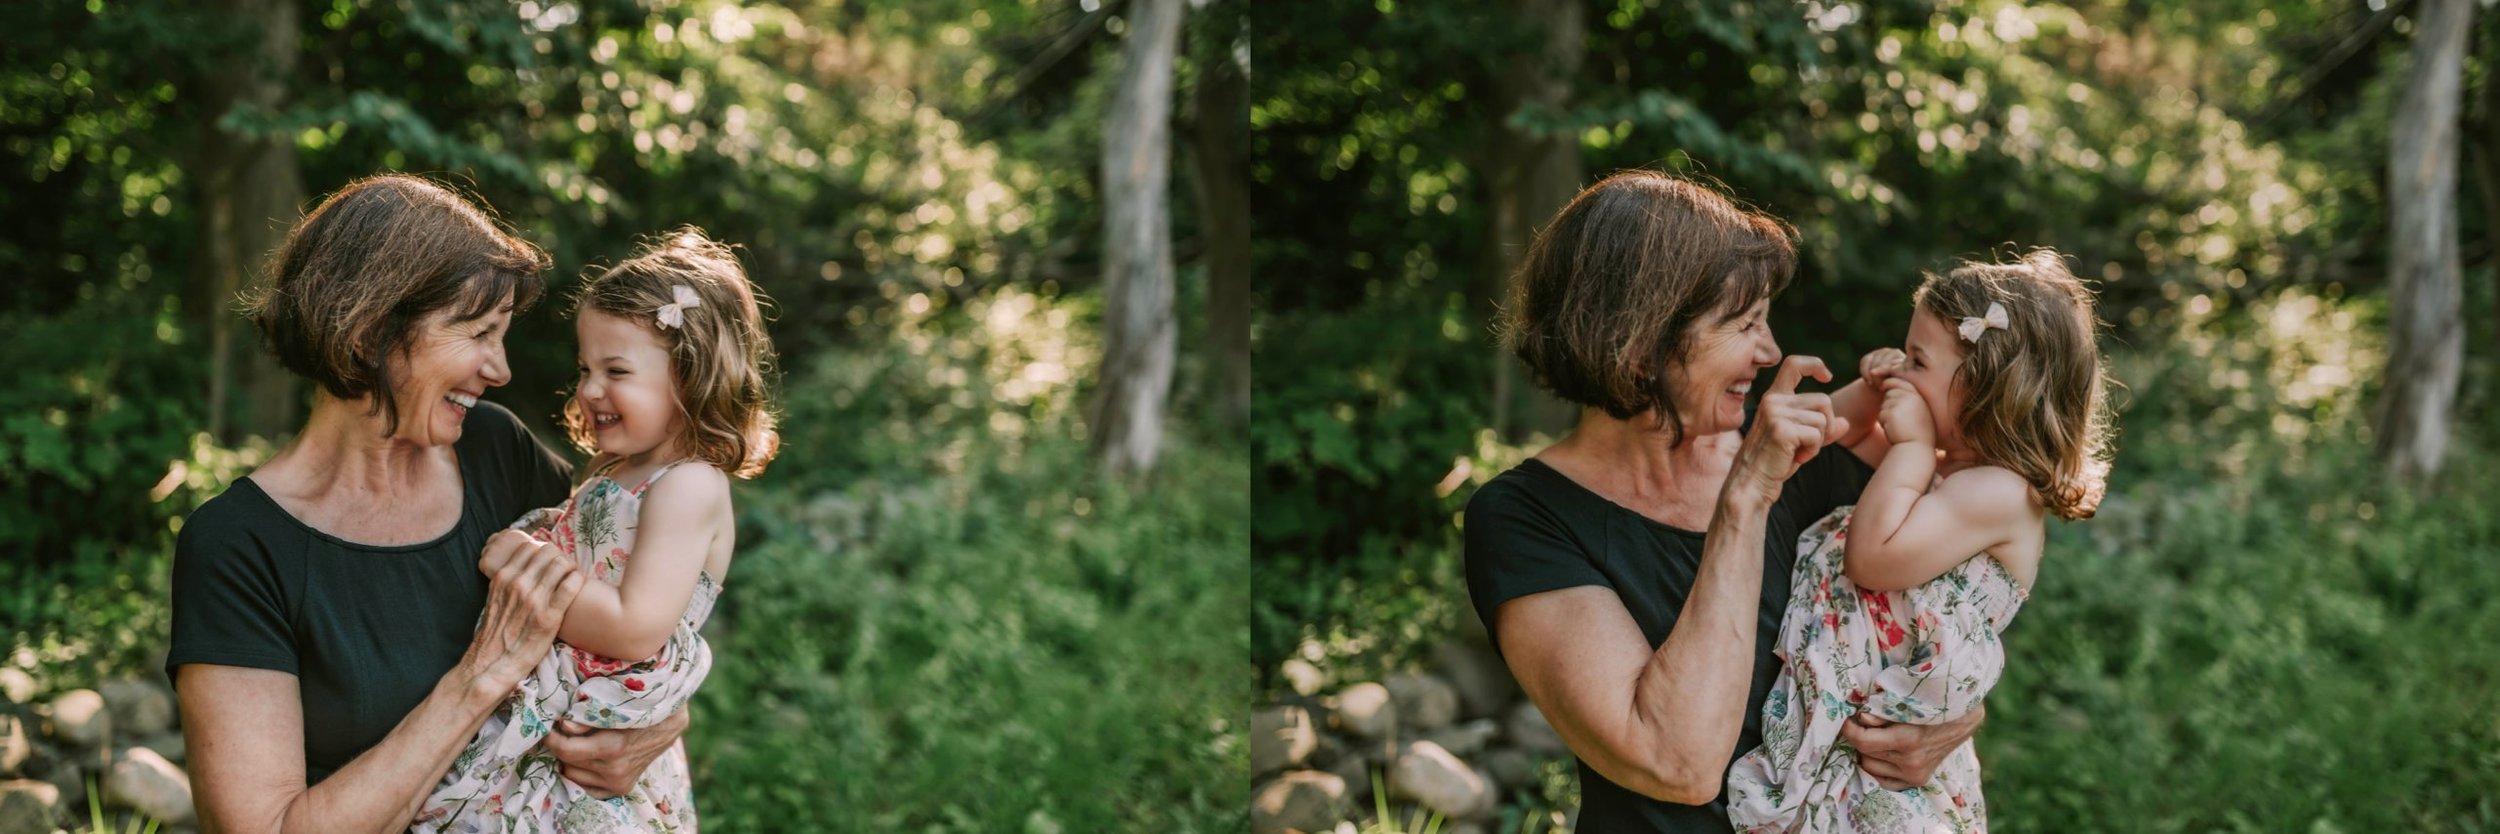 Summers_August_2018-22B_Beautiful_Natural_Portraits_by_Award_Winning_Boston_Massachusetts_Family_Portrait_Photographer_Asher_and_Oak_Photography.jpg